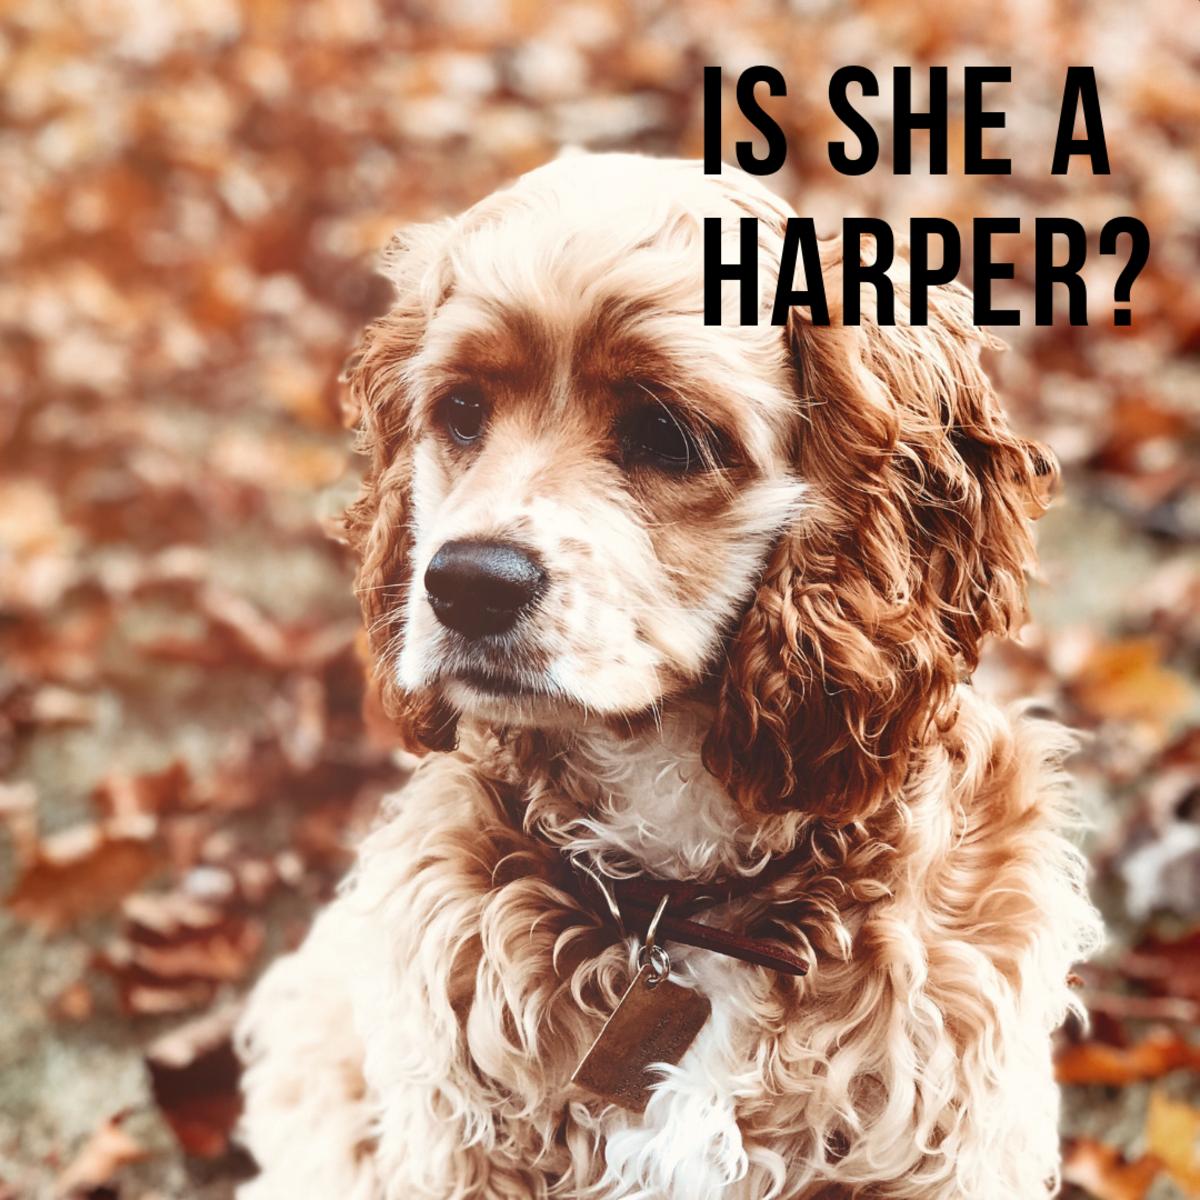 Is she a Harper?